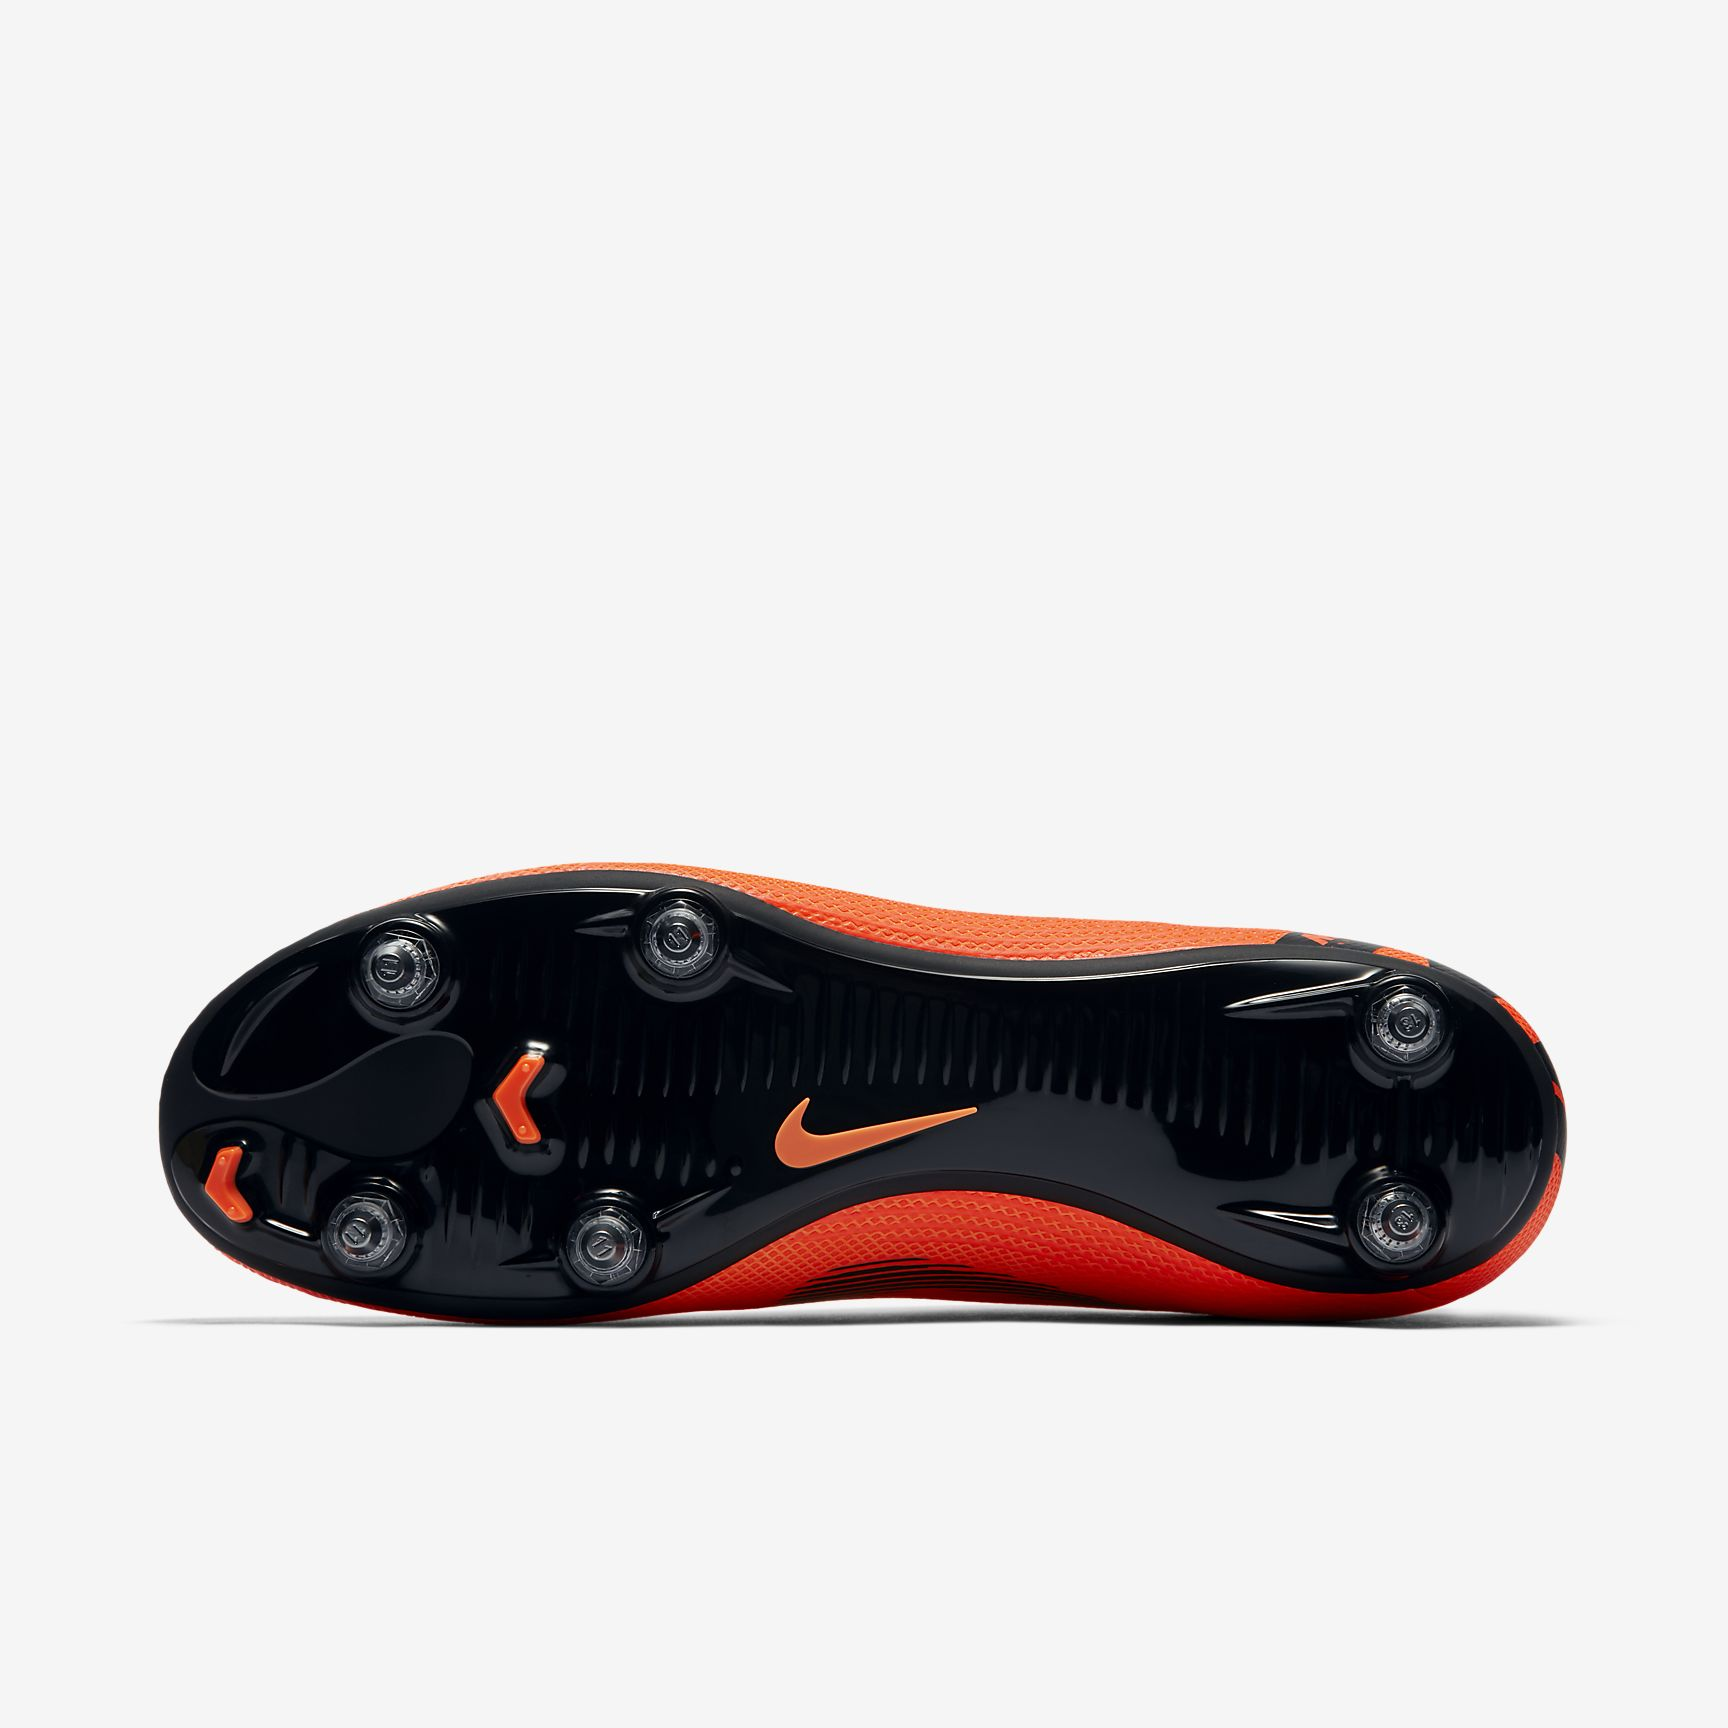 chaussures-football-Nike-Mercurial-Vapor-XII-Academy-img2